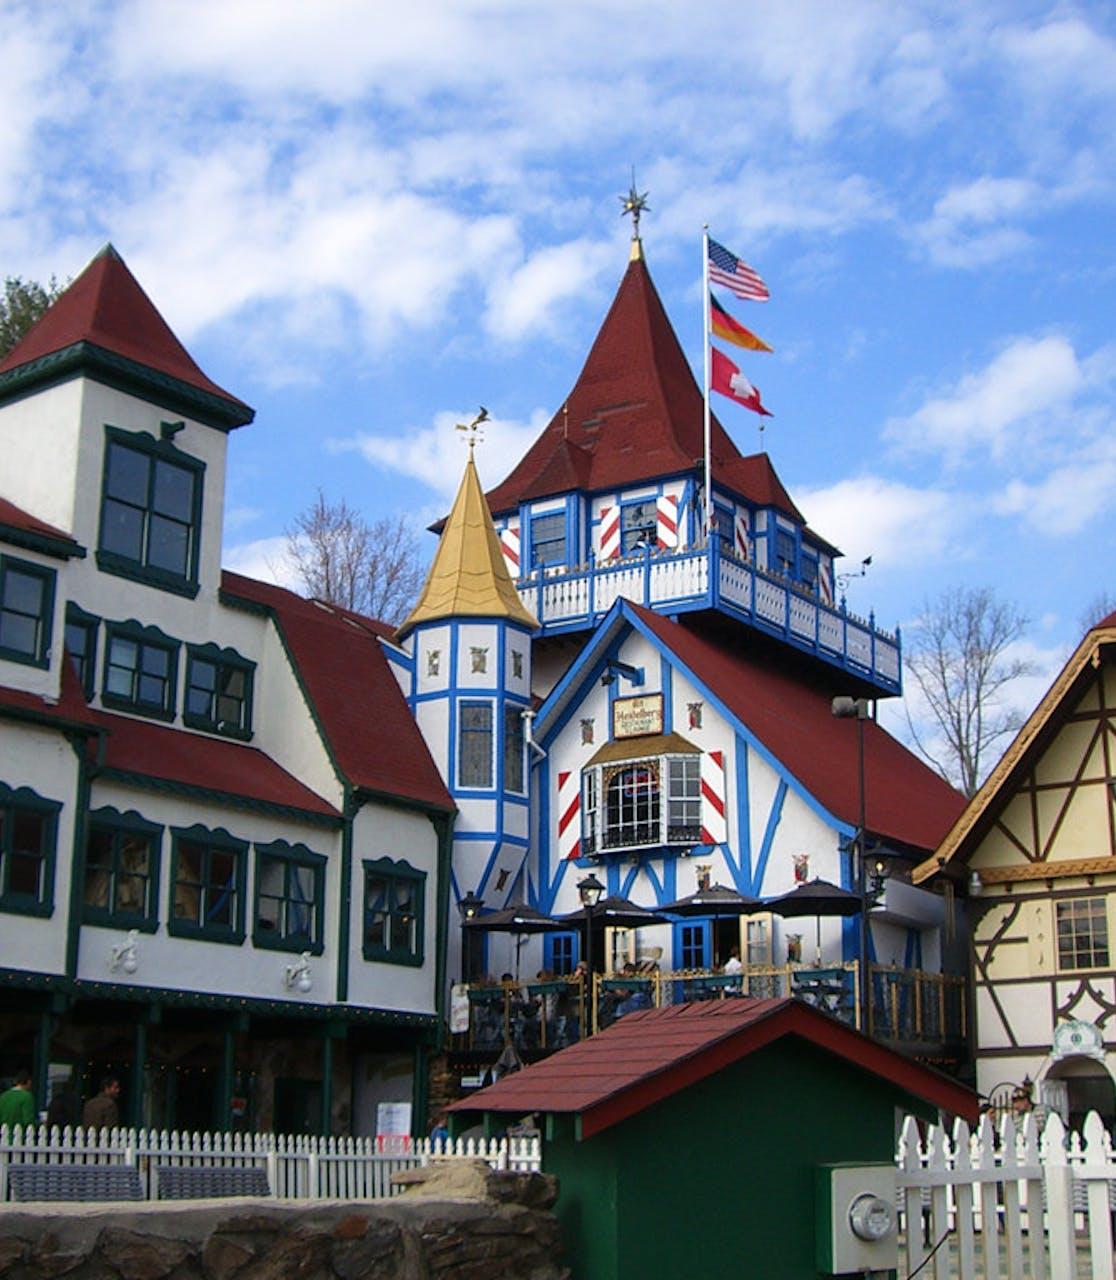 bavarian style buildings in downtown Helen, GA